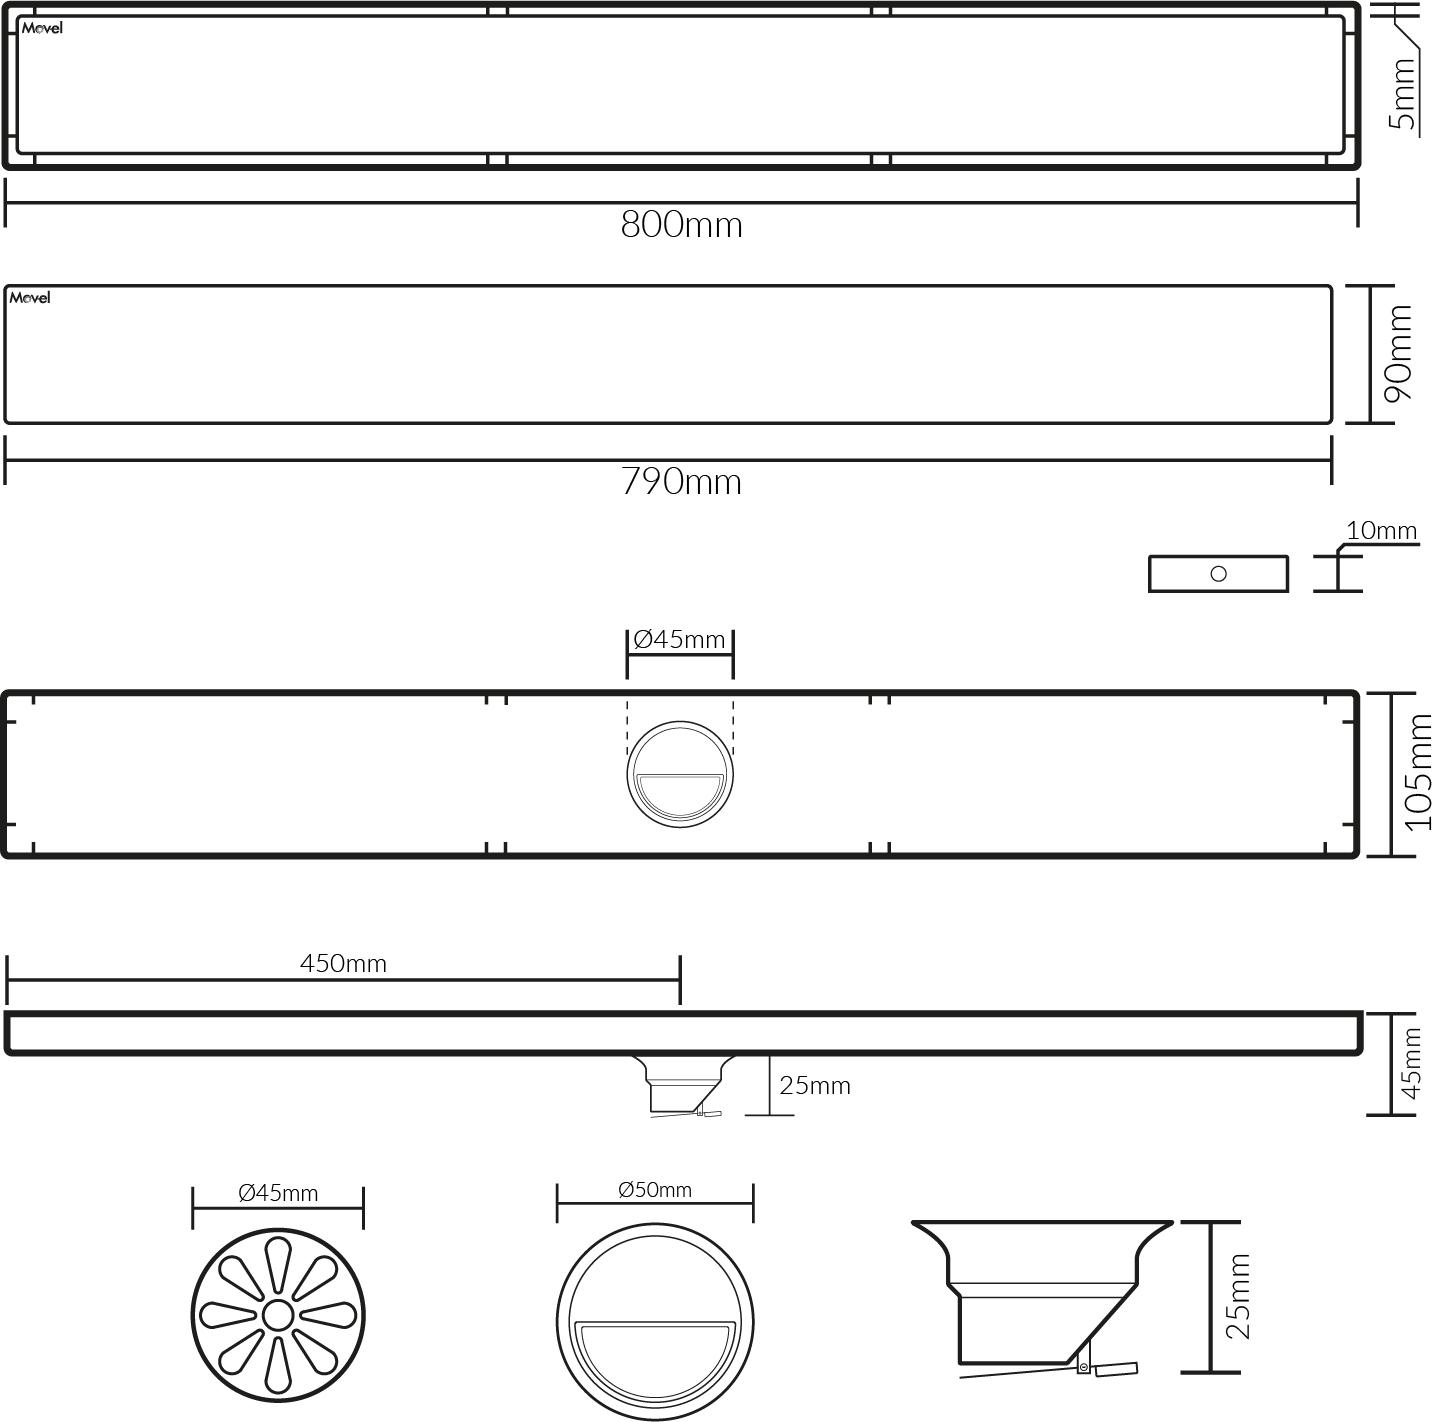 Ralo Linear Fechamento Automático Cromado 80x10cm